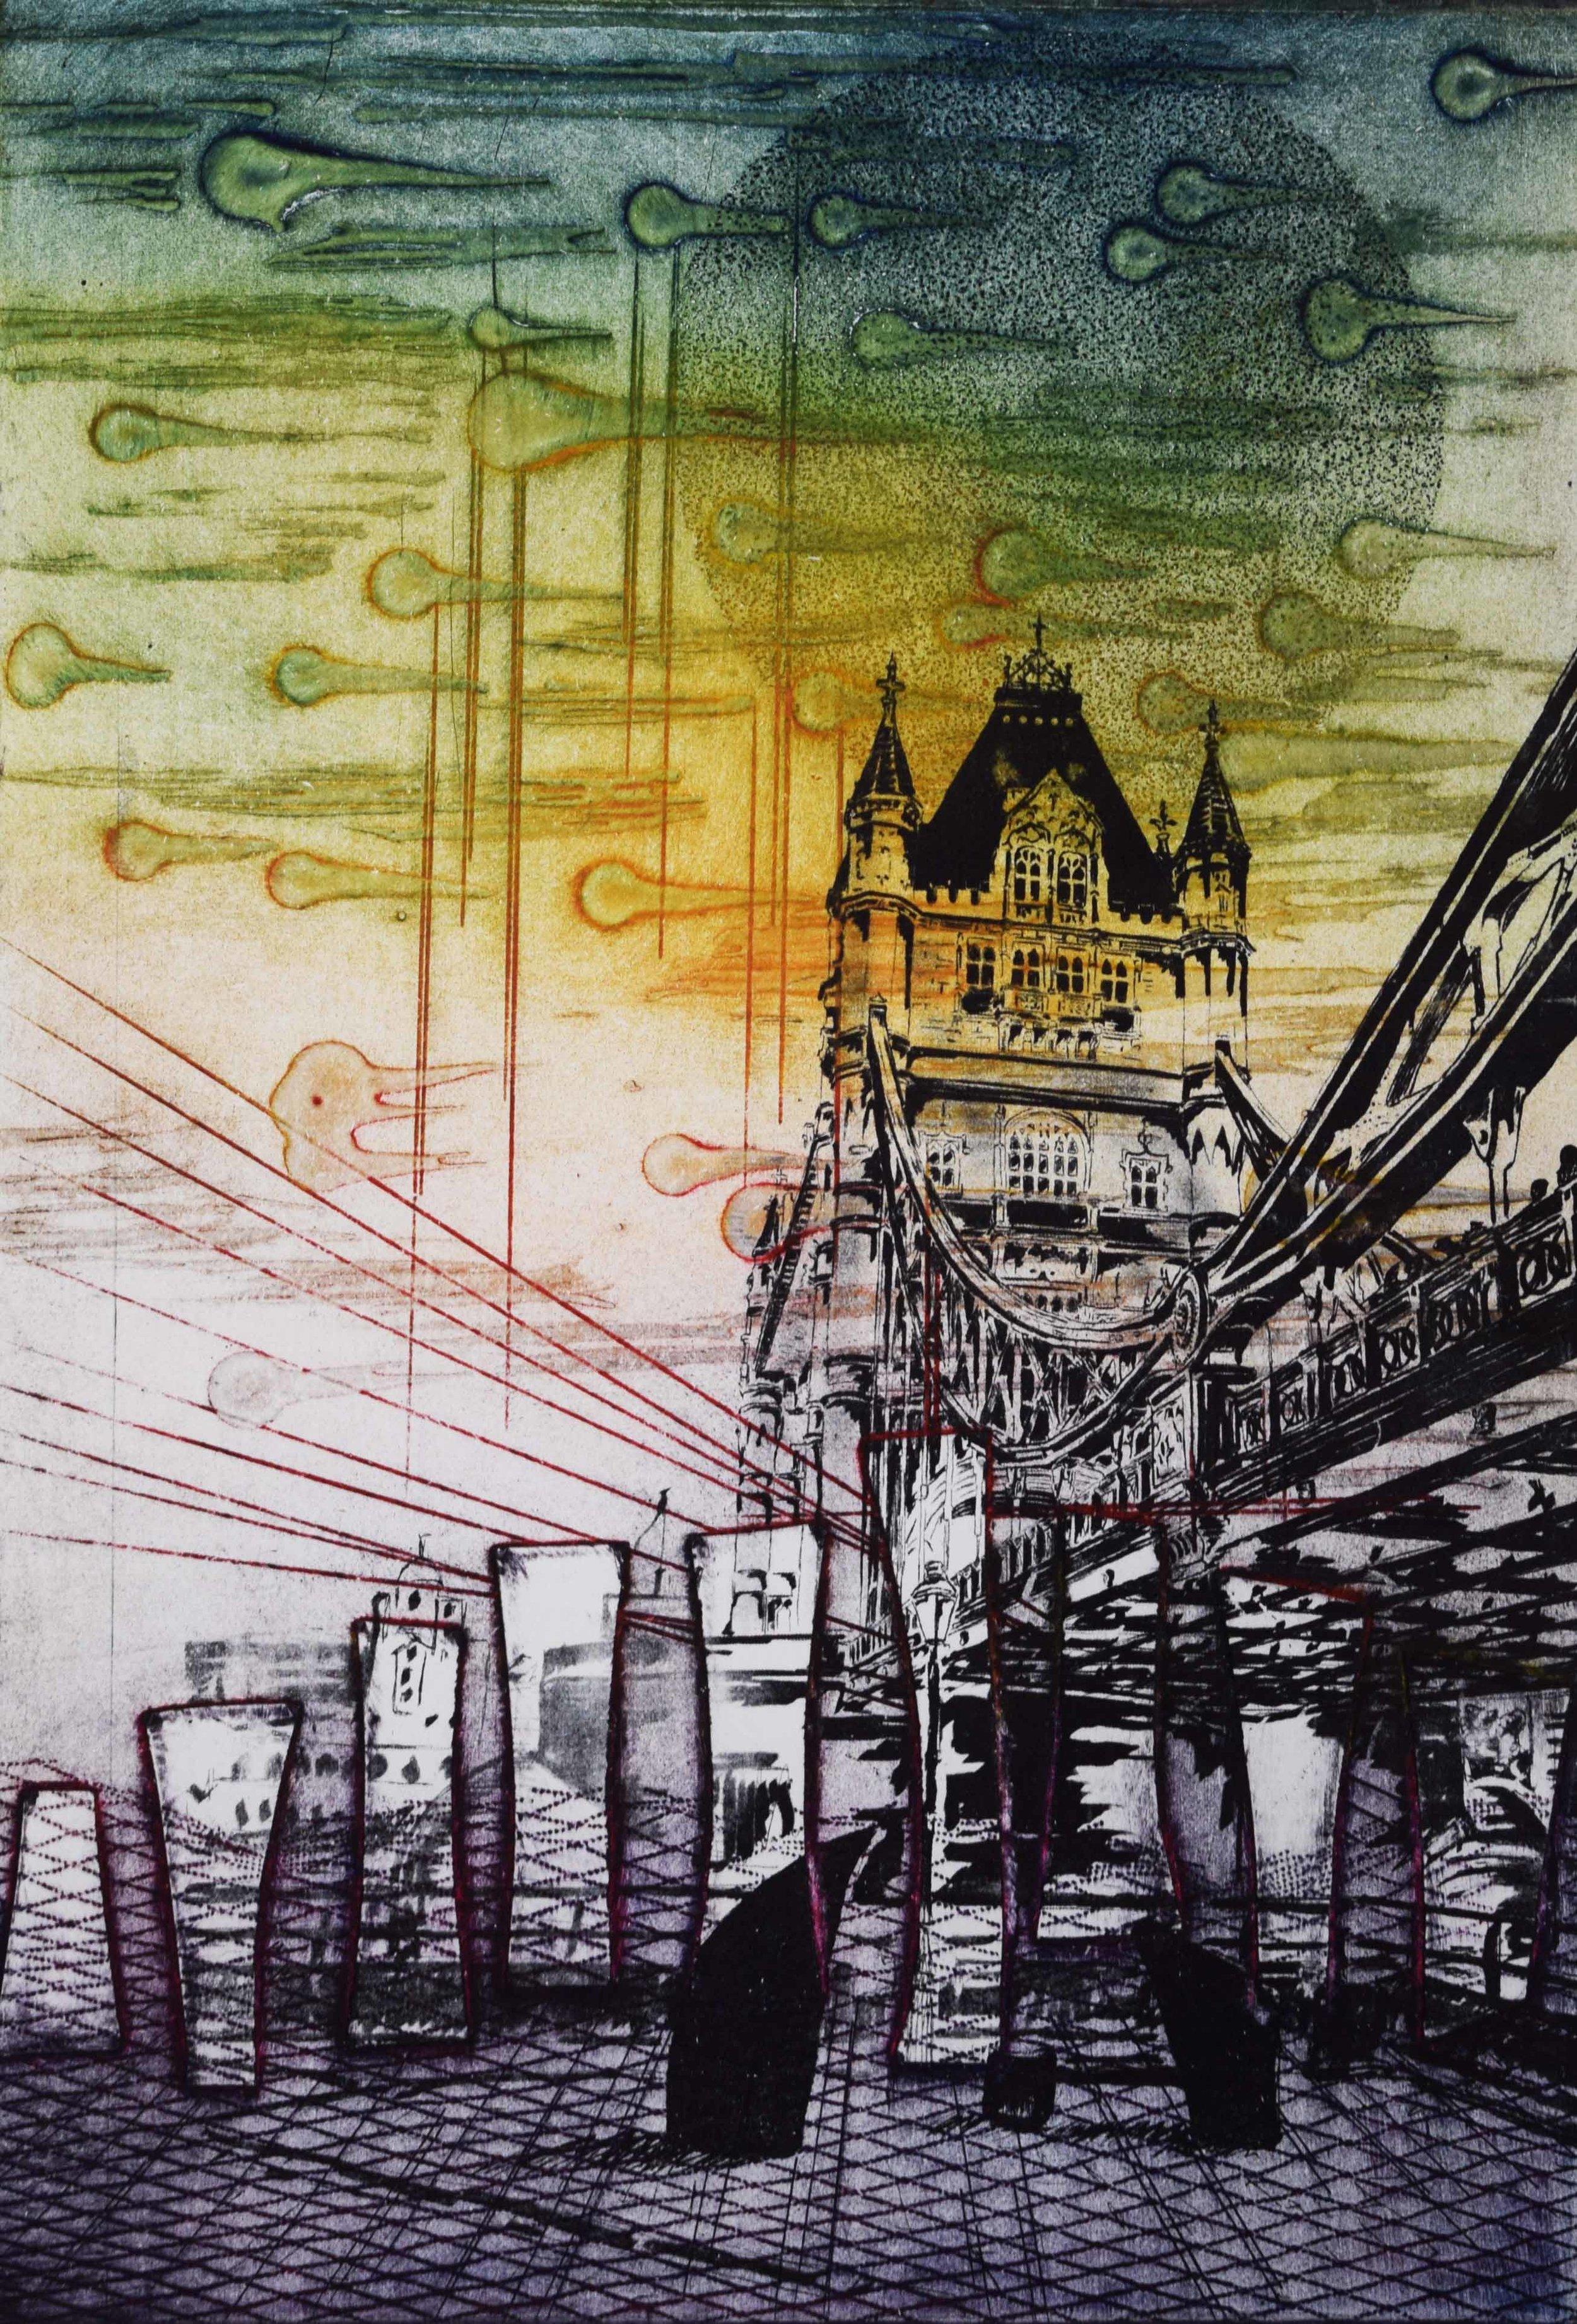 "Tower Bridge.Collograph and polyester plate. 50 x 40 cm                    Normal   0           false   false   false     EN-US   JA   X-NONE                                                                                                                                                                                                                                                                                                                                                                                                                                                                                                                                                                                                                                                                                                                                                                                                                                                                                    /* Style Definitions */ table.MsoNormalTable {mso-style-name:""Table Normal""; mso-tstyle-rowband-size:0; mso-tstyle-colband-size:0; mso-style-noshow:yes; mso-style-priority:99; mso-style-parent:""""; mso-padding-alt:0cm 5.4pt 0cm 5.4pt; mso-para-margin:0cm; mso-para-margin-bottom:.0001pt; mso-pagination:widow-orphan; font-size:12.0pt; font-family:Cambria; mso-ascii-font-family:Cambria; mso-ascii-theme-font:minor-latin; mso-hansi-font-family:Cambria; mso-hansi-theme-font:minor-latin;}"